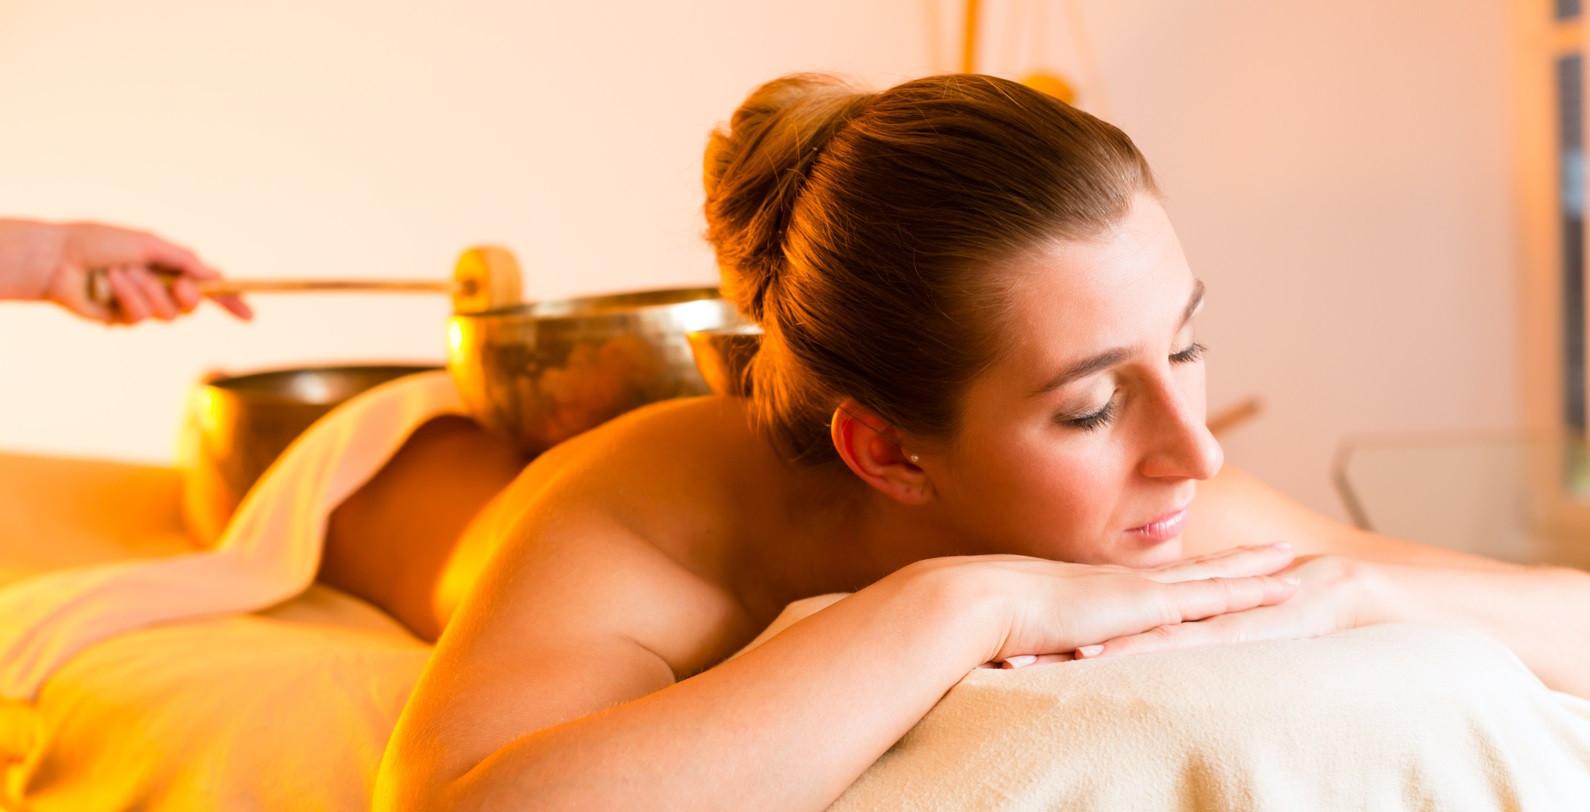 thai hieronta nokia gay sex massage